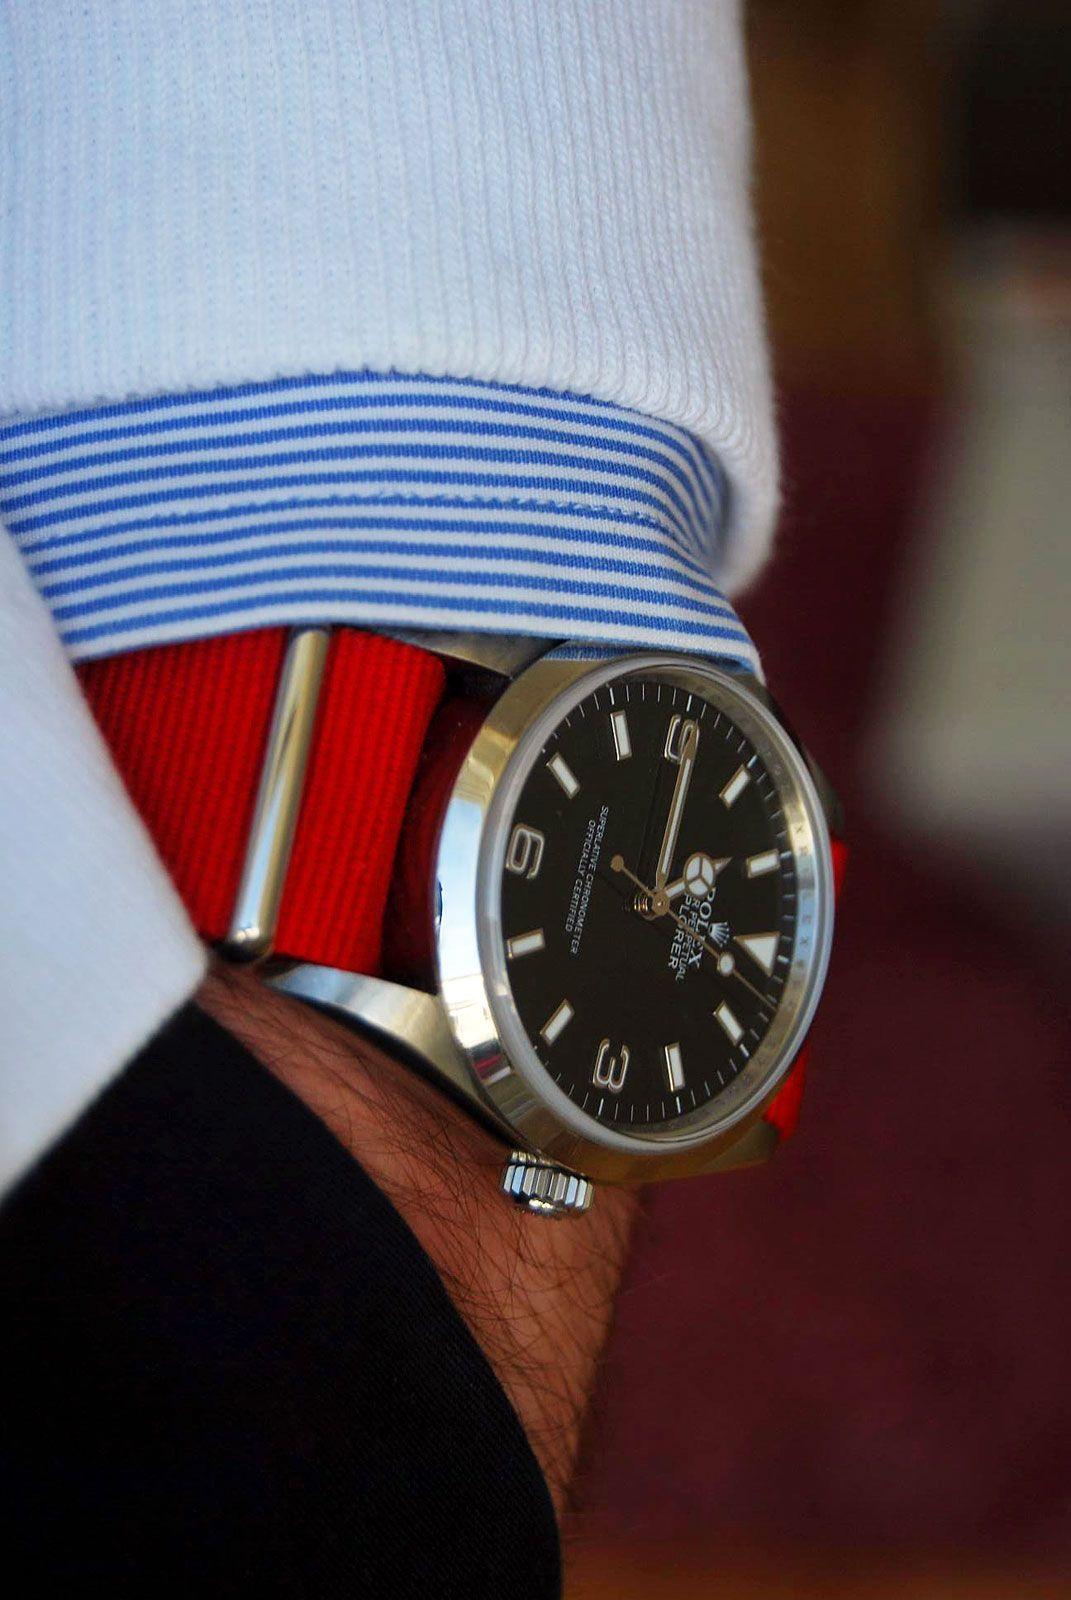 Rolex Explorer I with Red NATO Strap | Time | Rolex ...